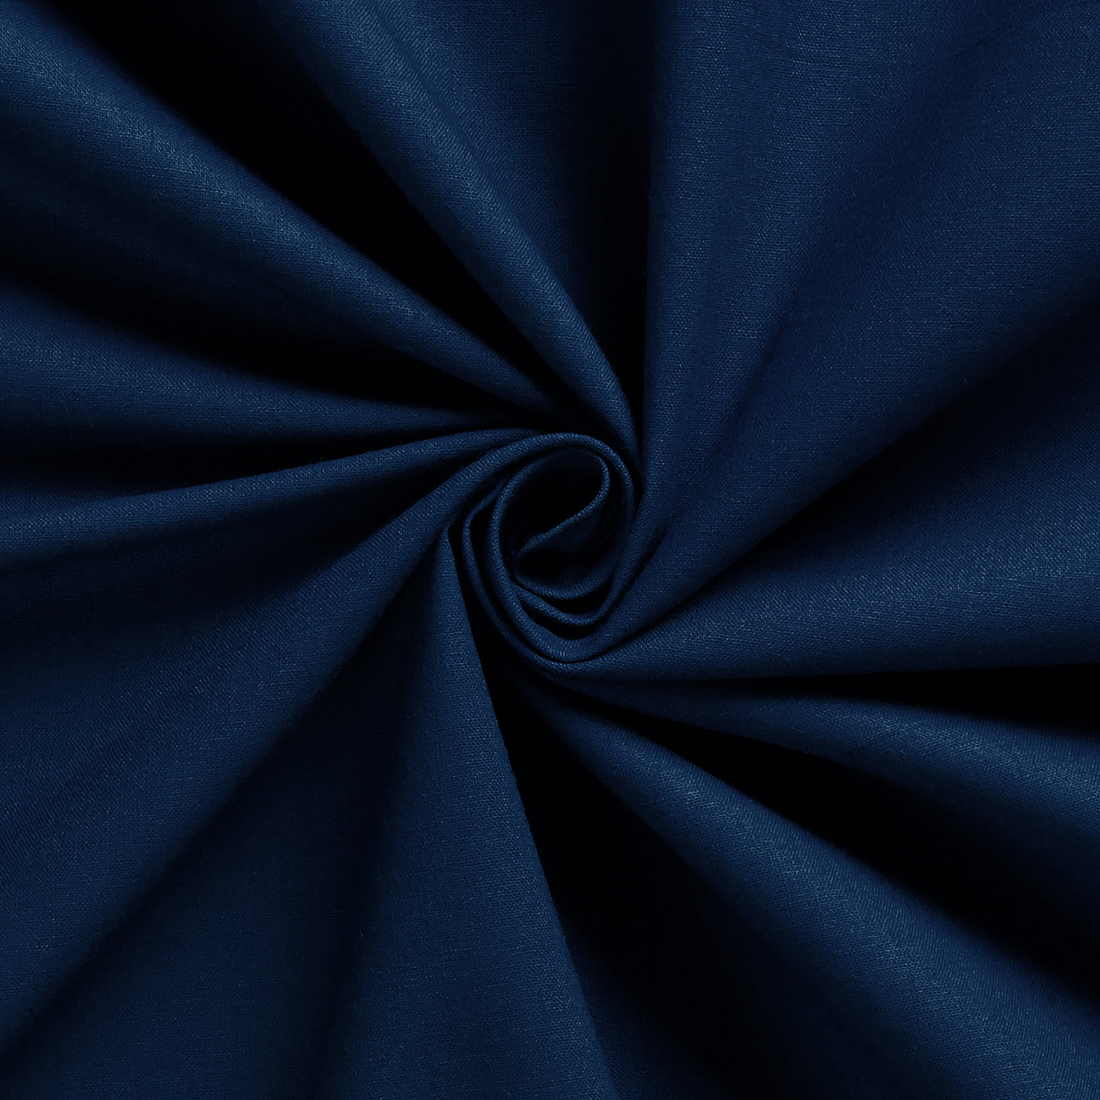 Craft Cotton Navy Fabric